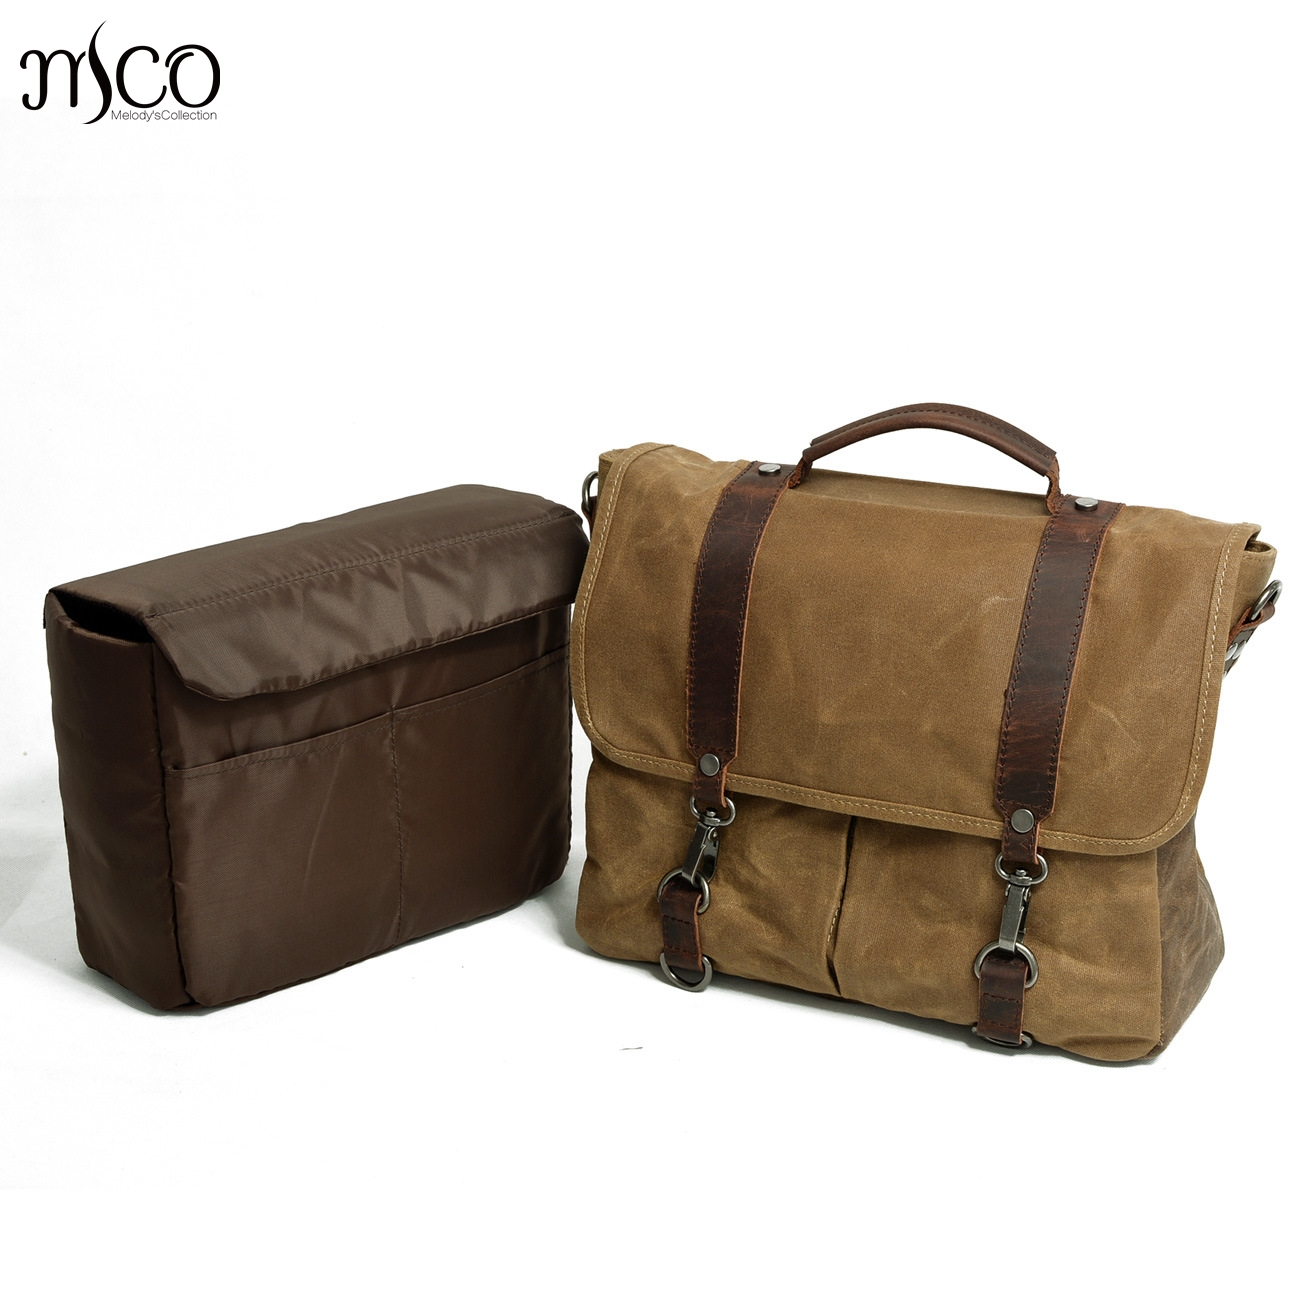 New Retro cloth waterproof Canvas Bag Charcoal Waxed Shoulder Portable Photography Camera Bag Messenger Bag цена